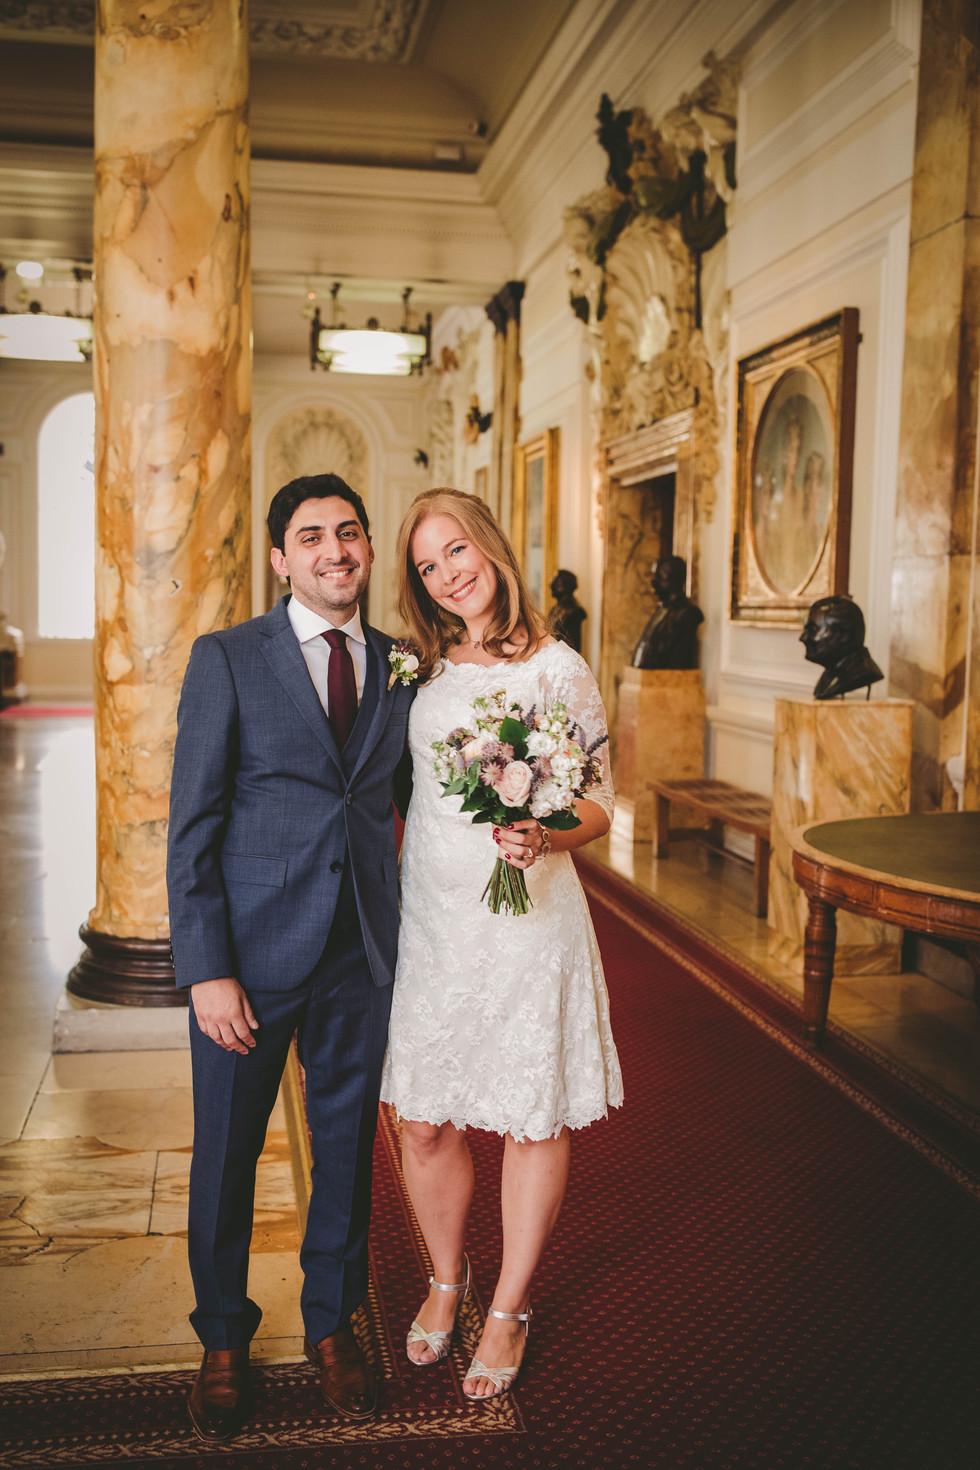 Pettigrew-City-Hall-Wedding (127 of 512)